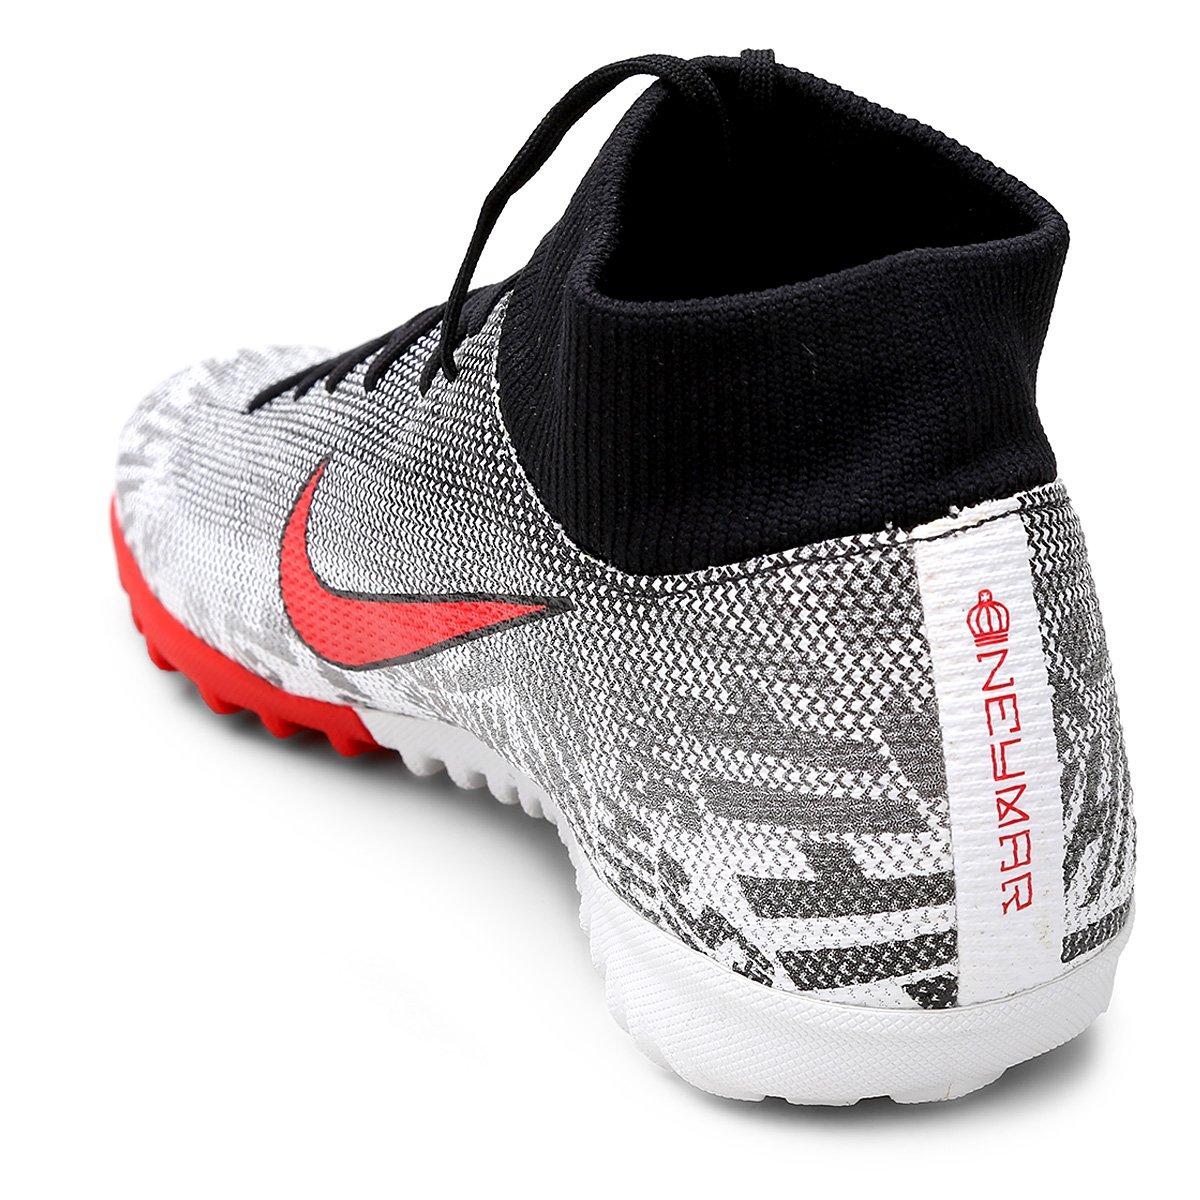 d23736decd661 ... Chuteira Society Nike Mercurial Superfly 6 Academy Neymar Jr TF - Tam:  37 - 1 ...